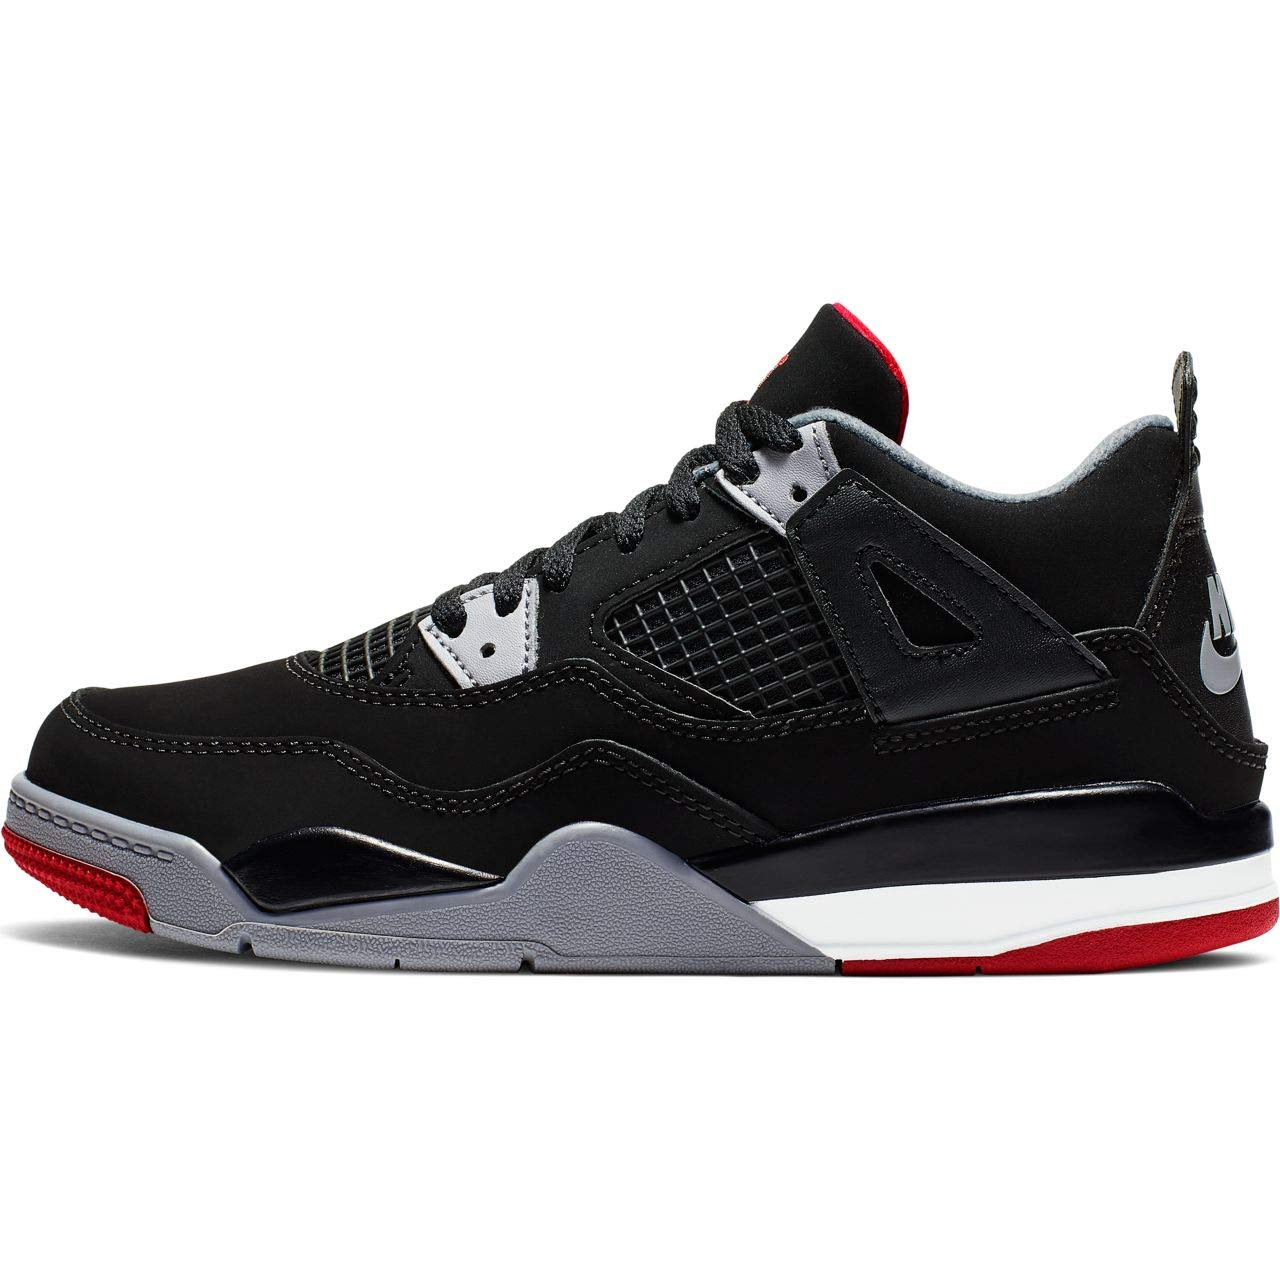 Air Jordan Retro 4''Bred Black/Fire Red-Cement Grey (PS) (2.5 M US Little Kid)